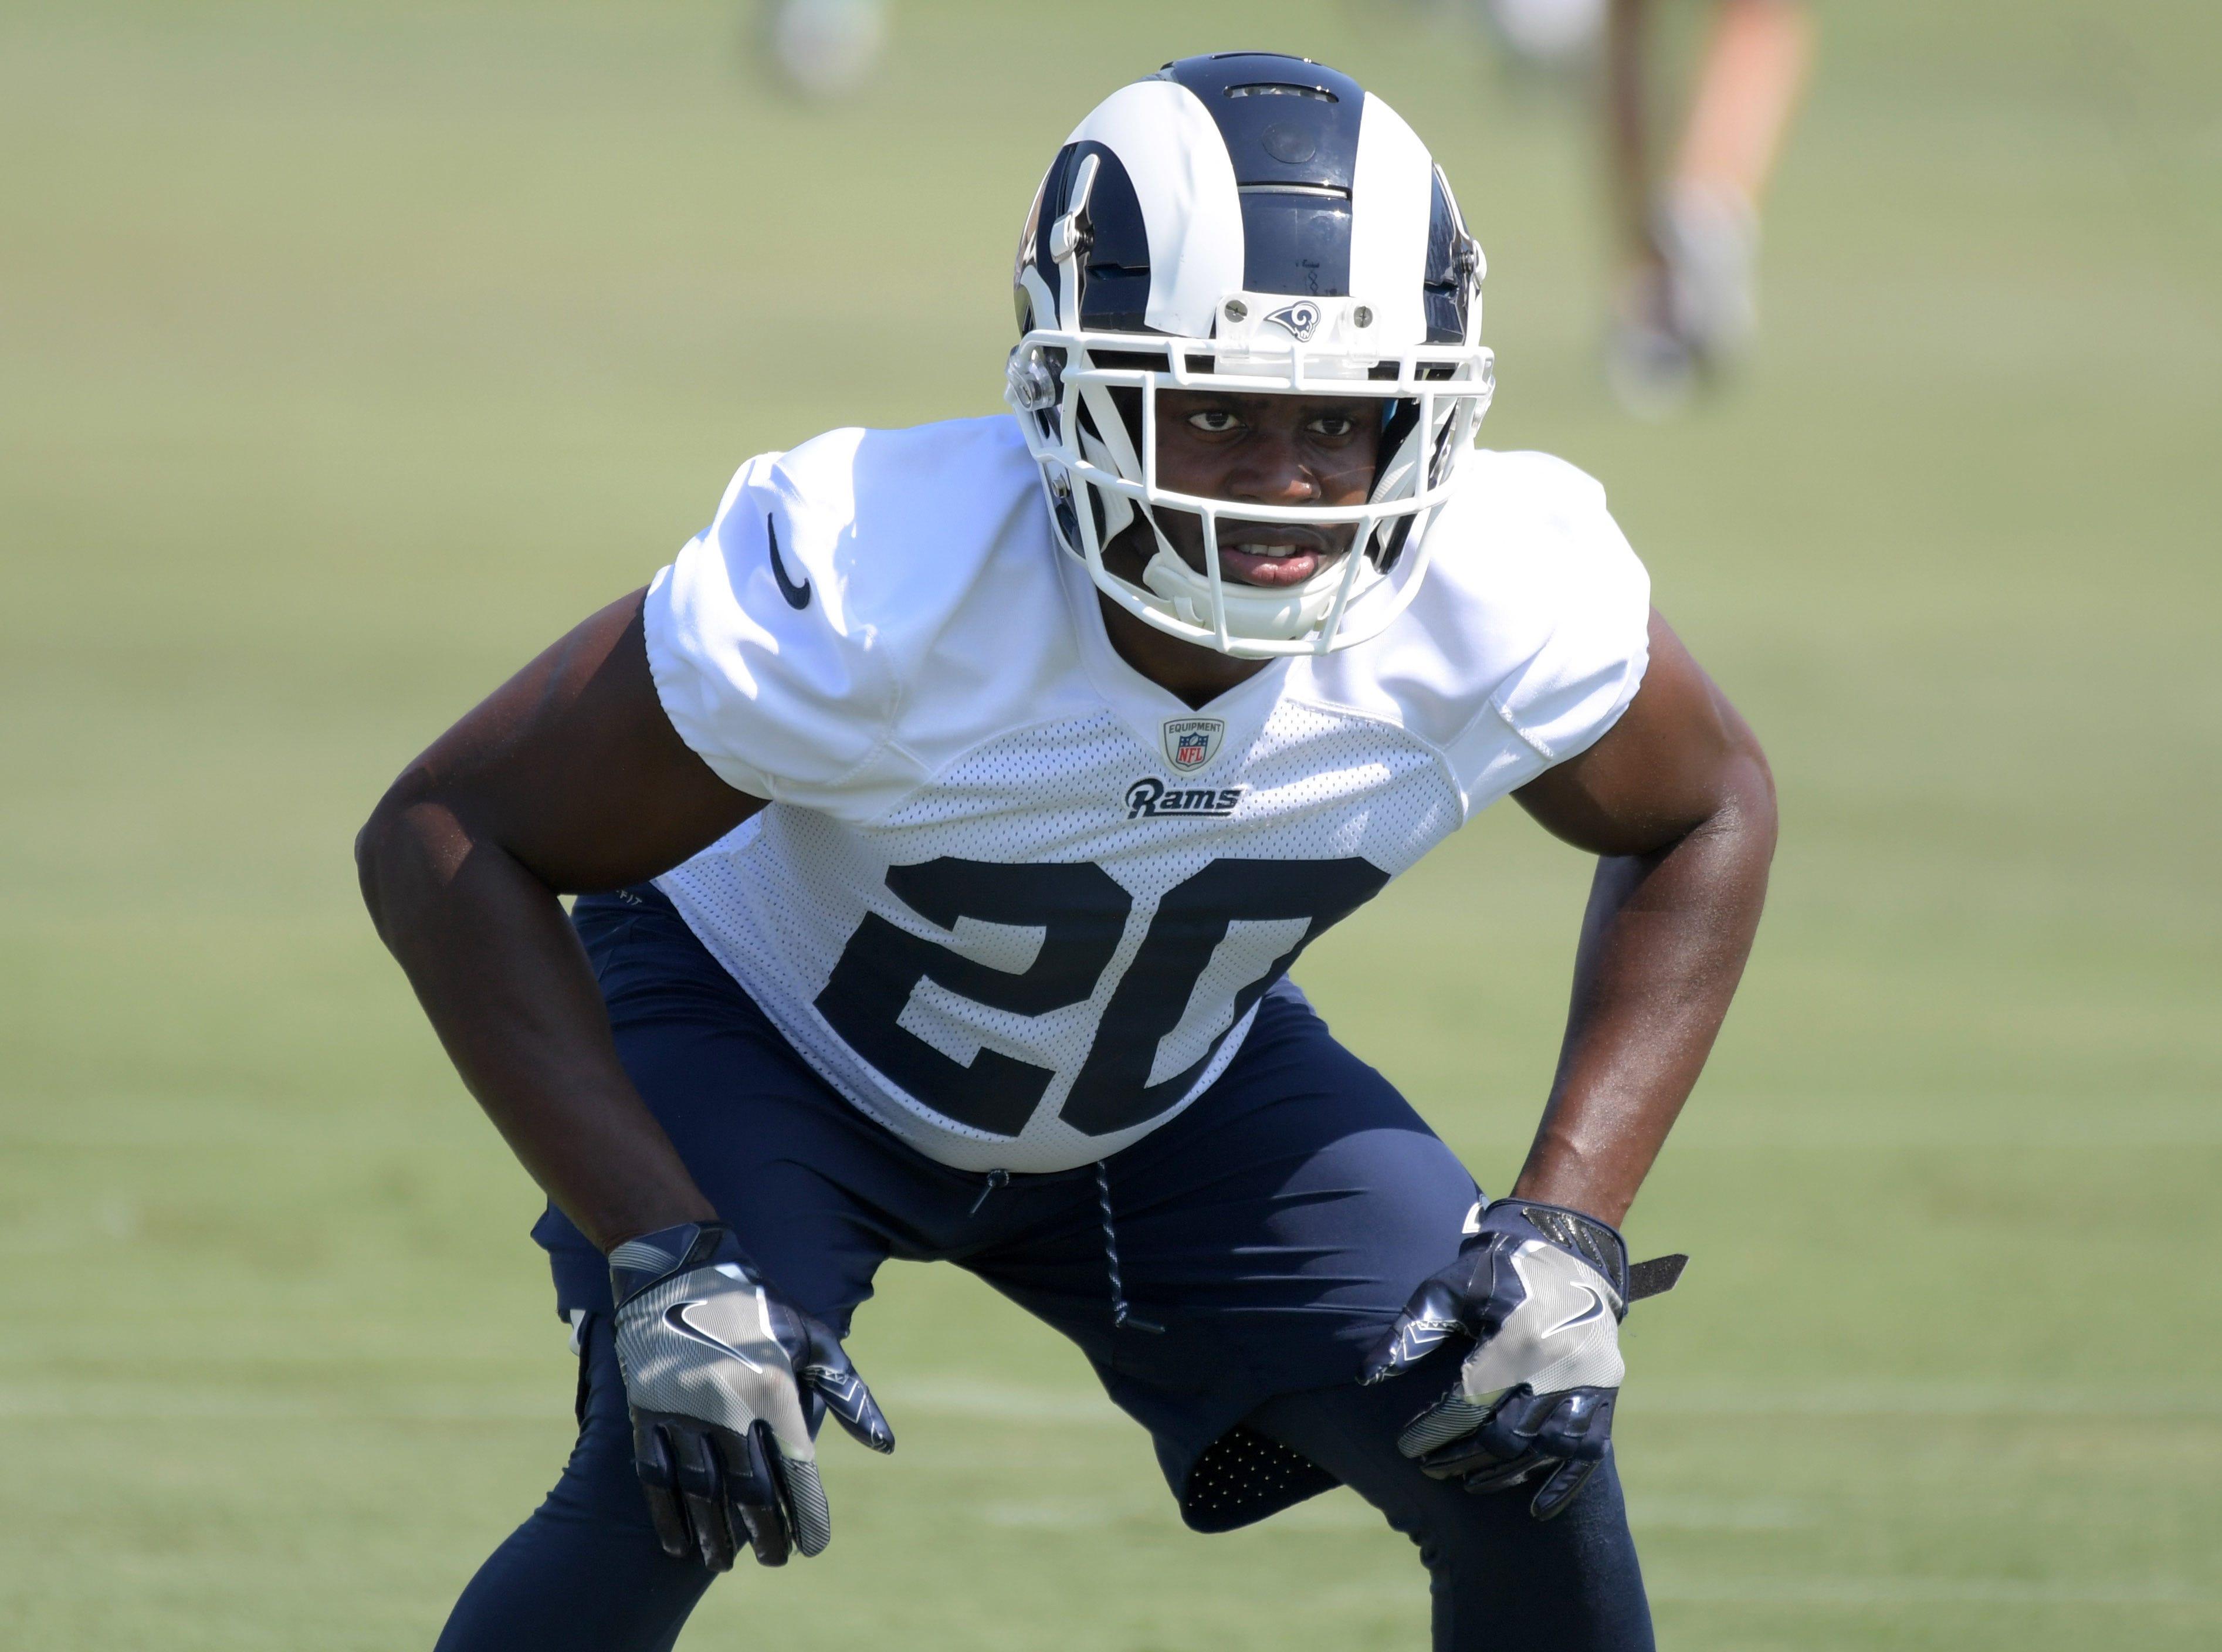 Jul 28, 2018; Irvine, CA, USA; Los Angeles Rams safety Lamarcus Joyner (20) during training camp at UC Irvine. Mandatory Credit: Kirby Lee-USA TODAY Sports